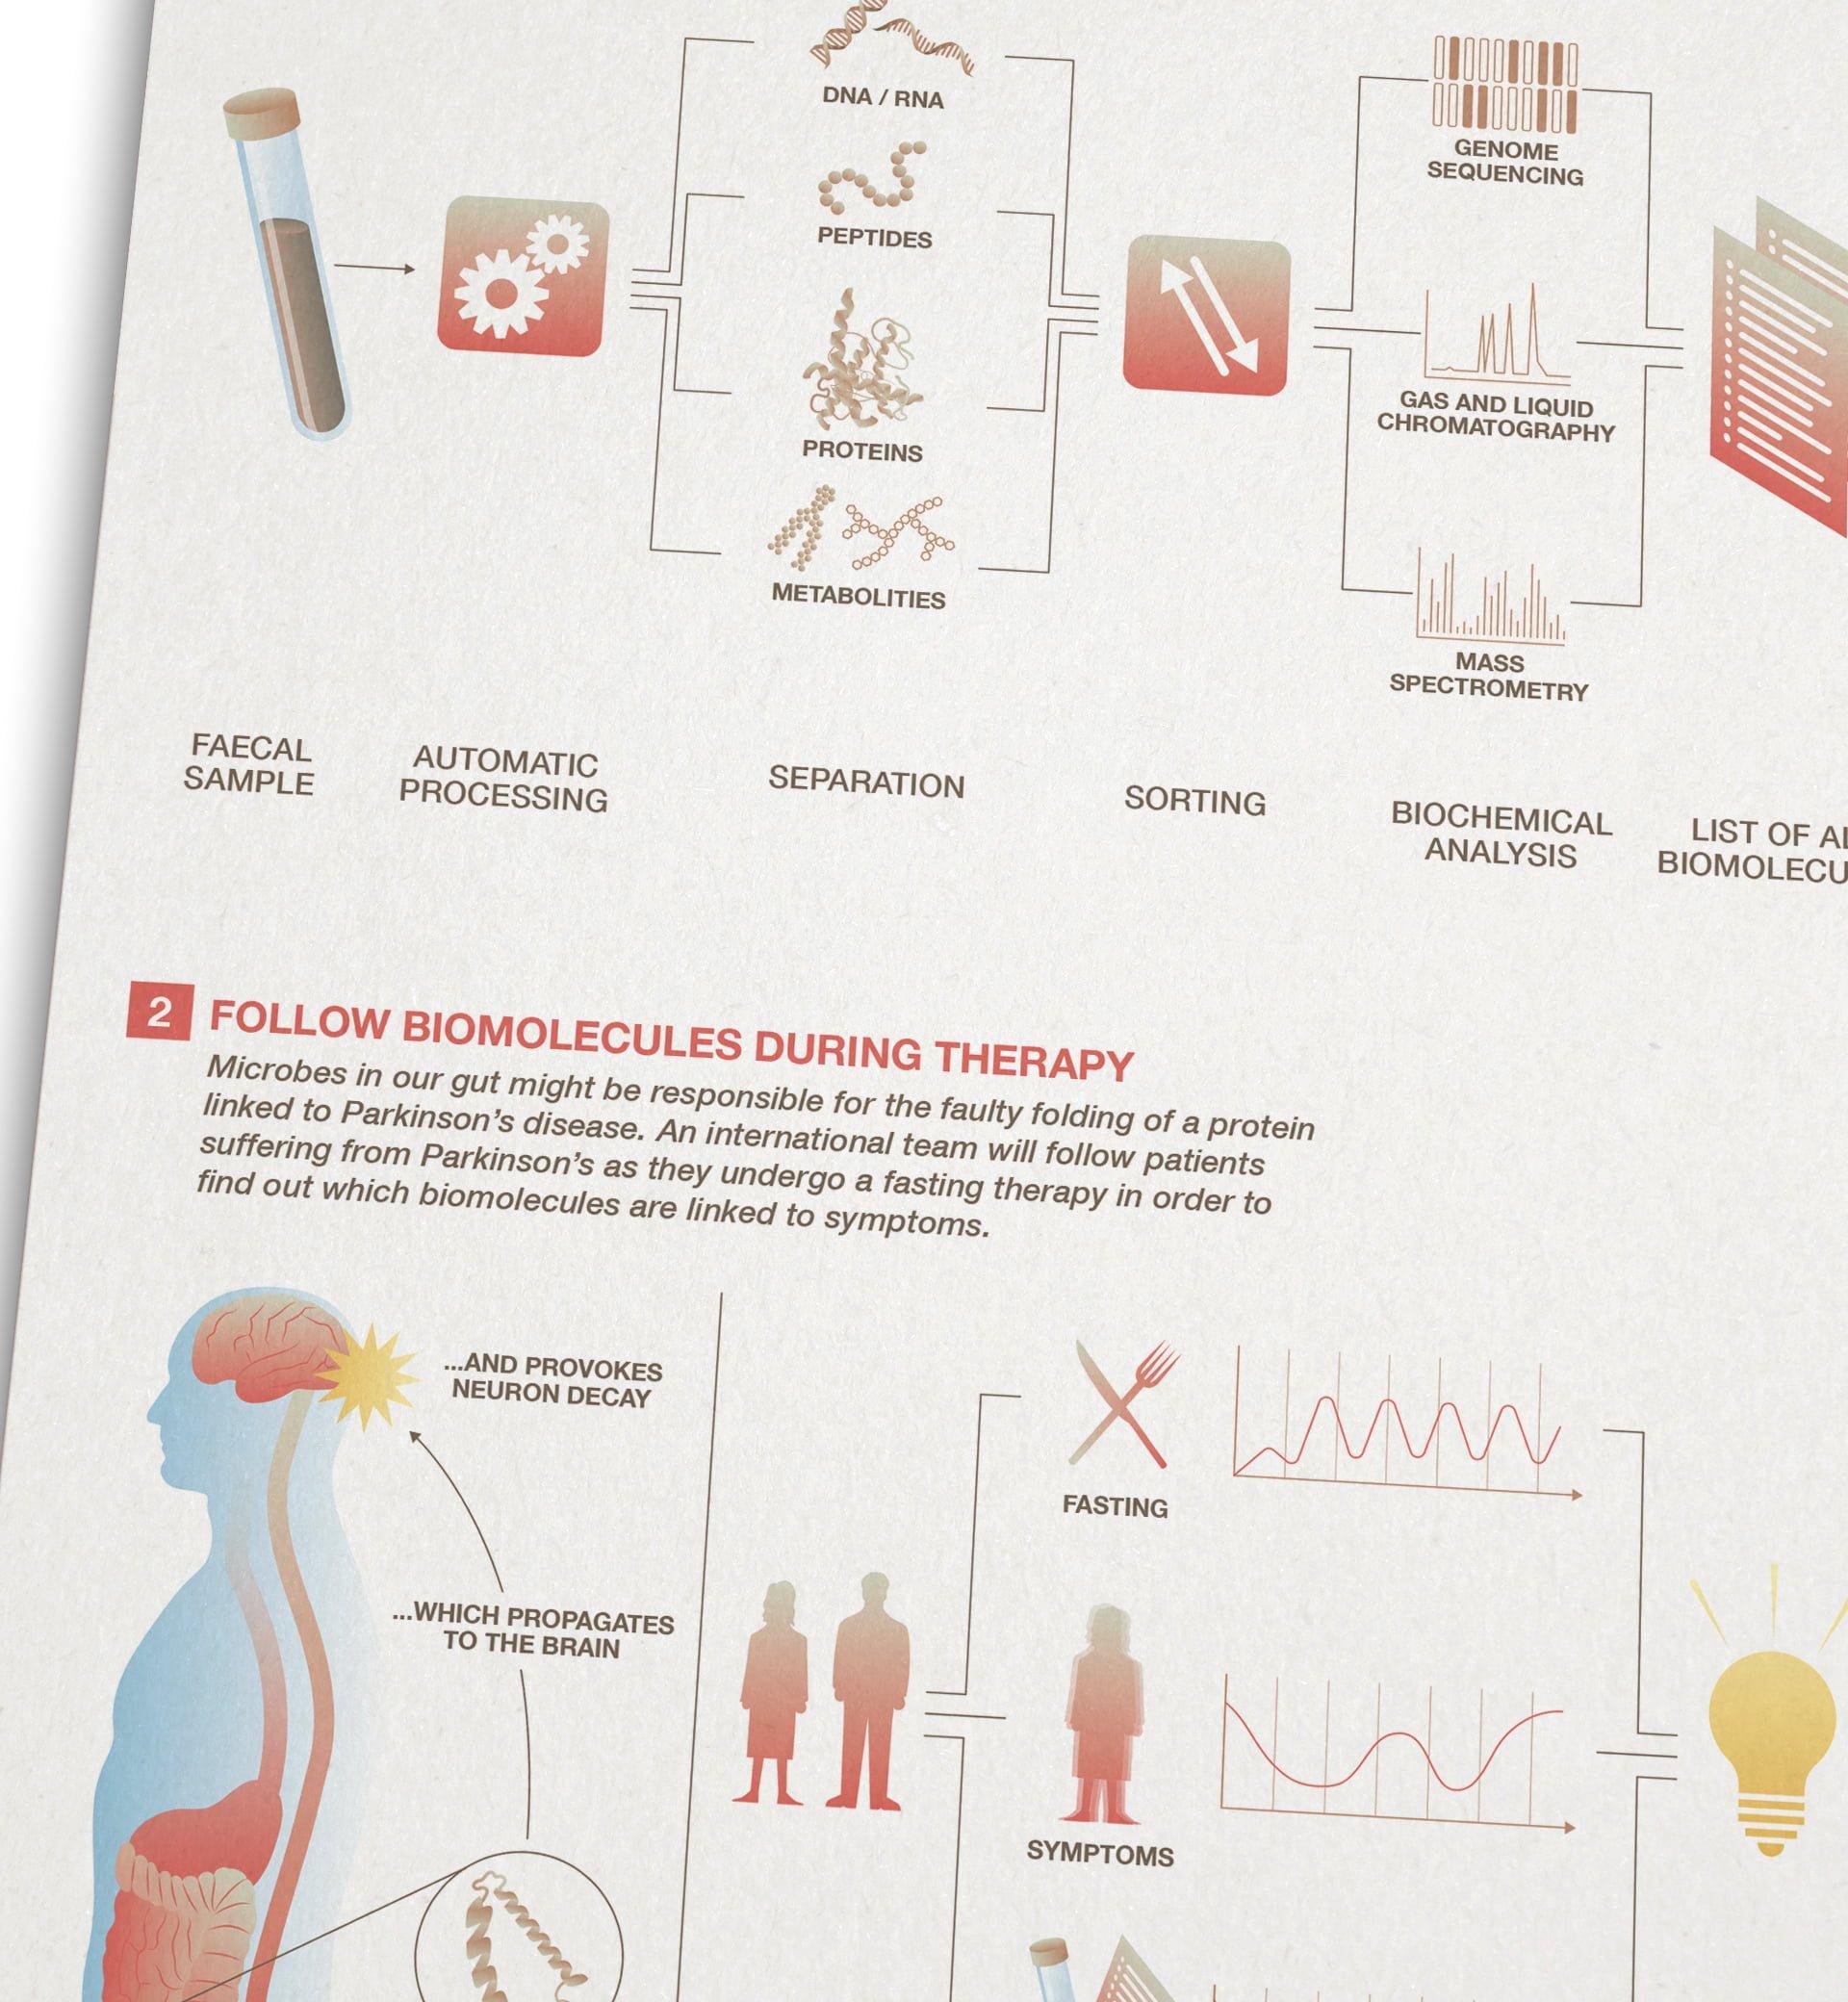 FNR infografik 9 biomolecules ikonaut